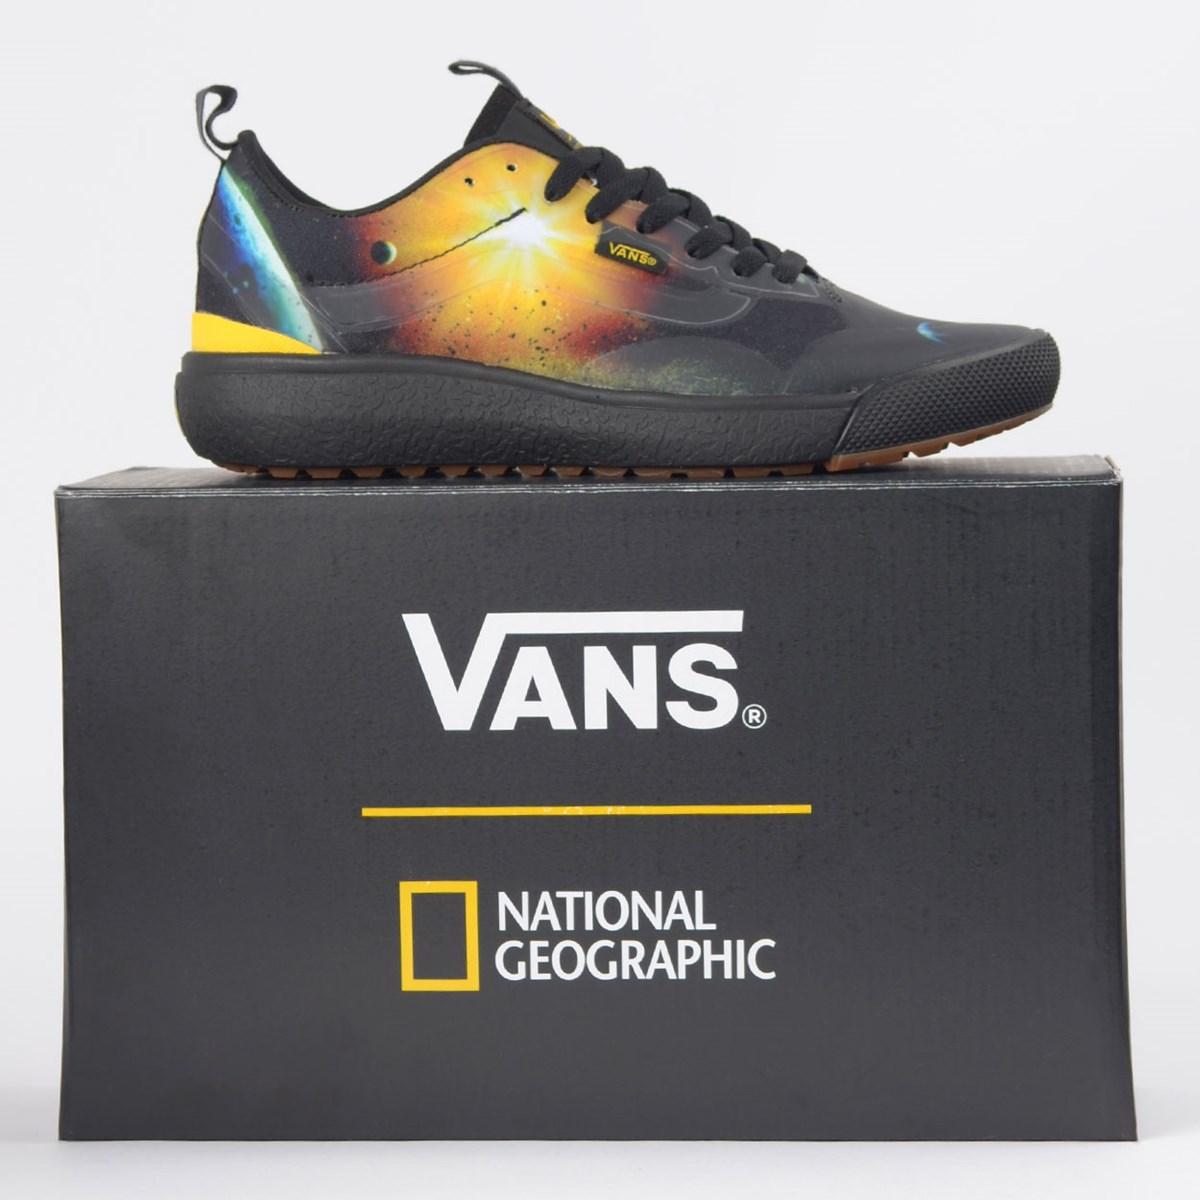 Tênis Vans Ultrarange Exo National Geographic Black Yellow VN0A4U1KXU3